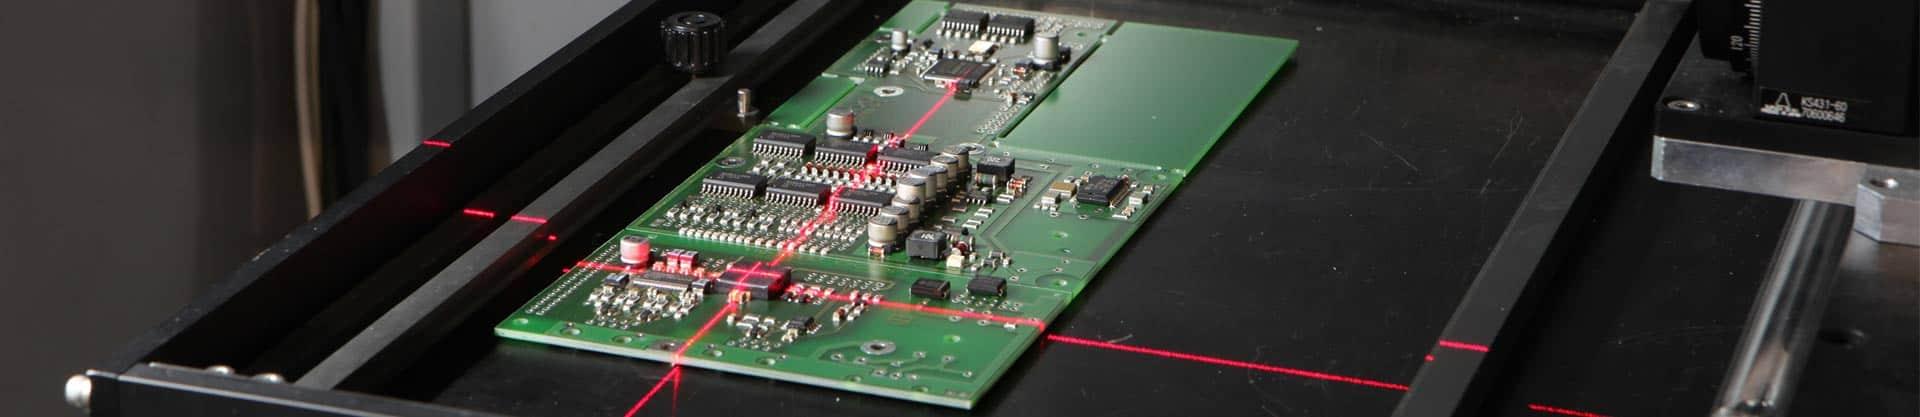 BGA Rework Process in PCB Assembly